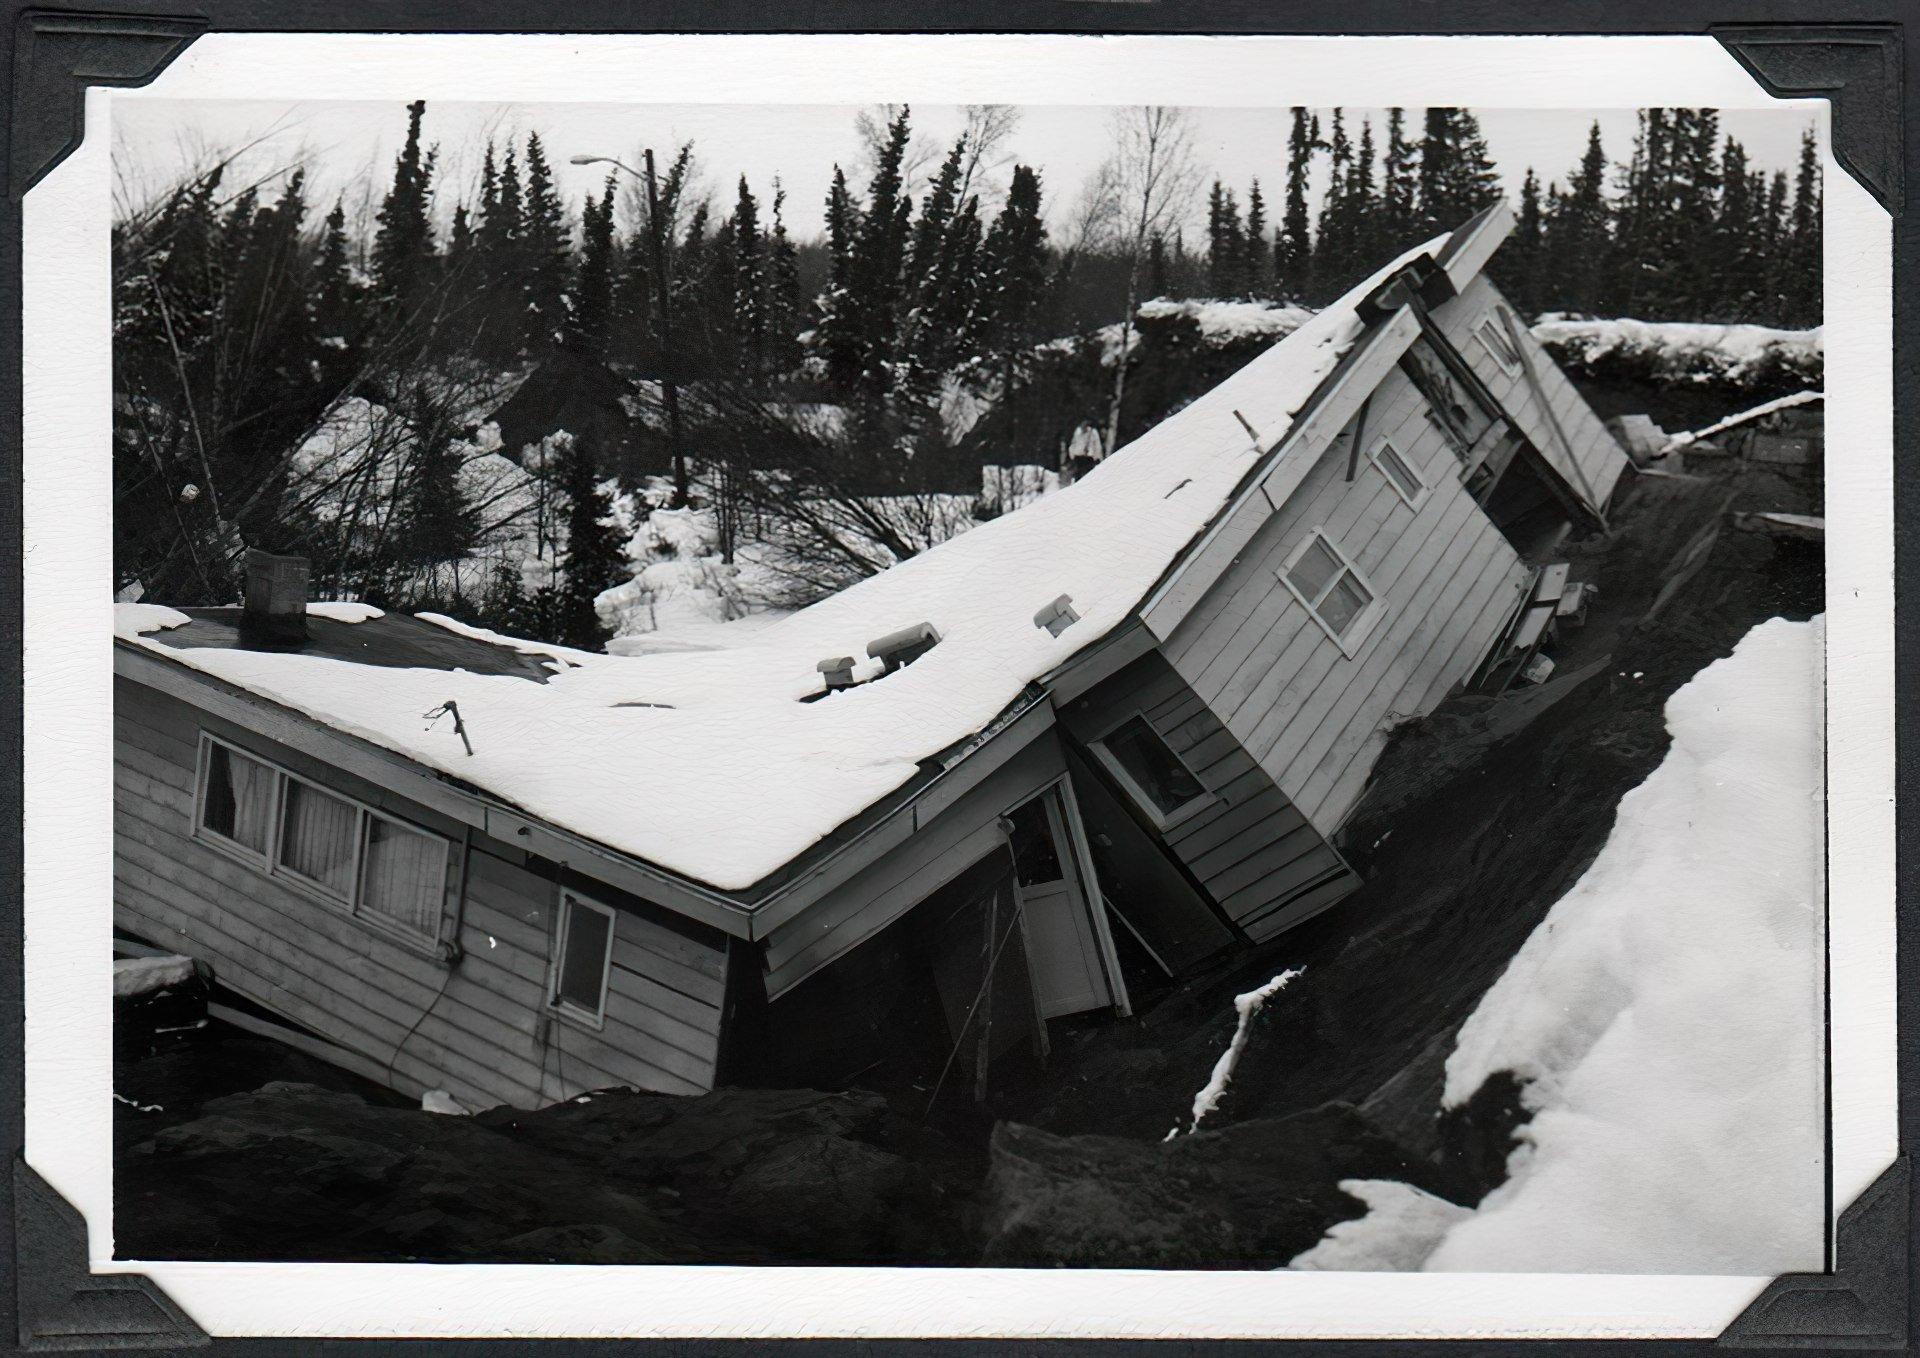 Home torn in half by the 1964 Alaska earthquake